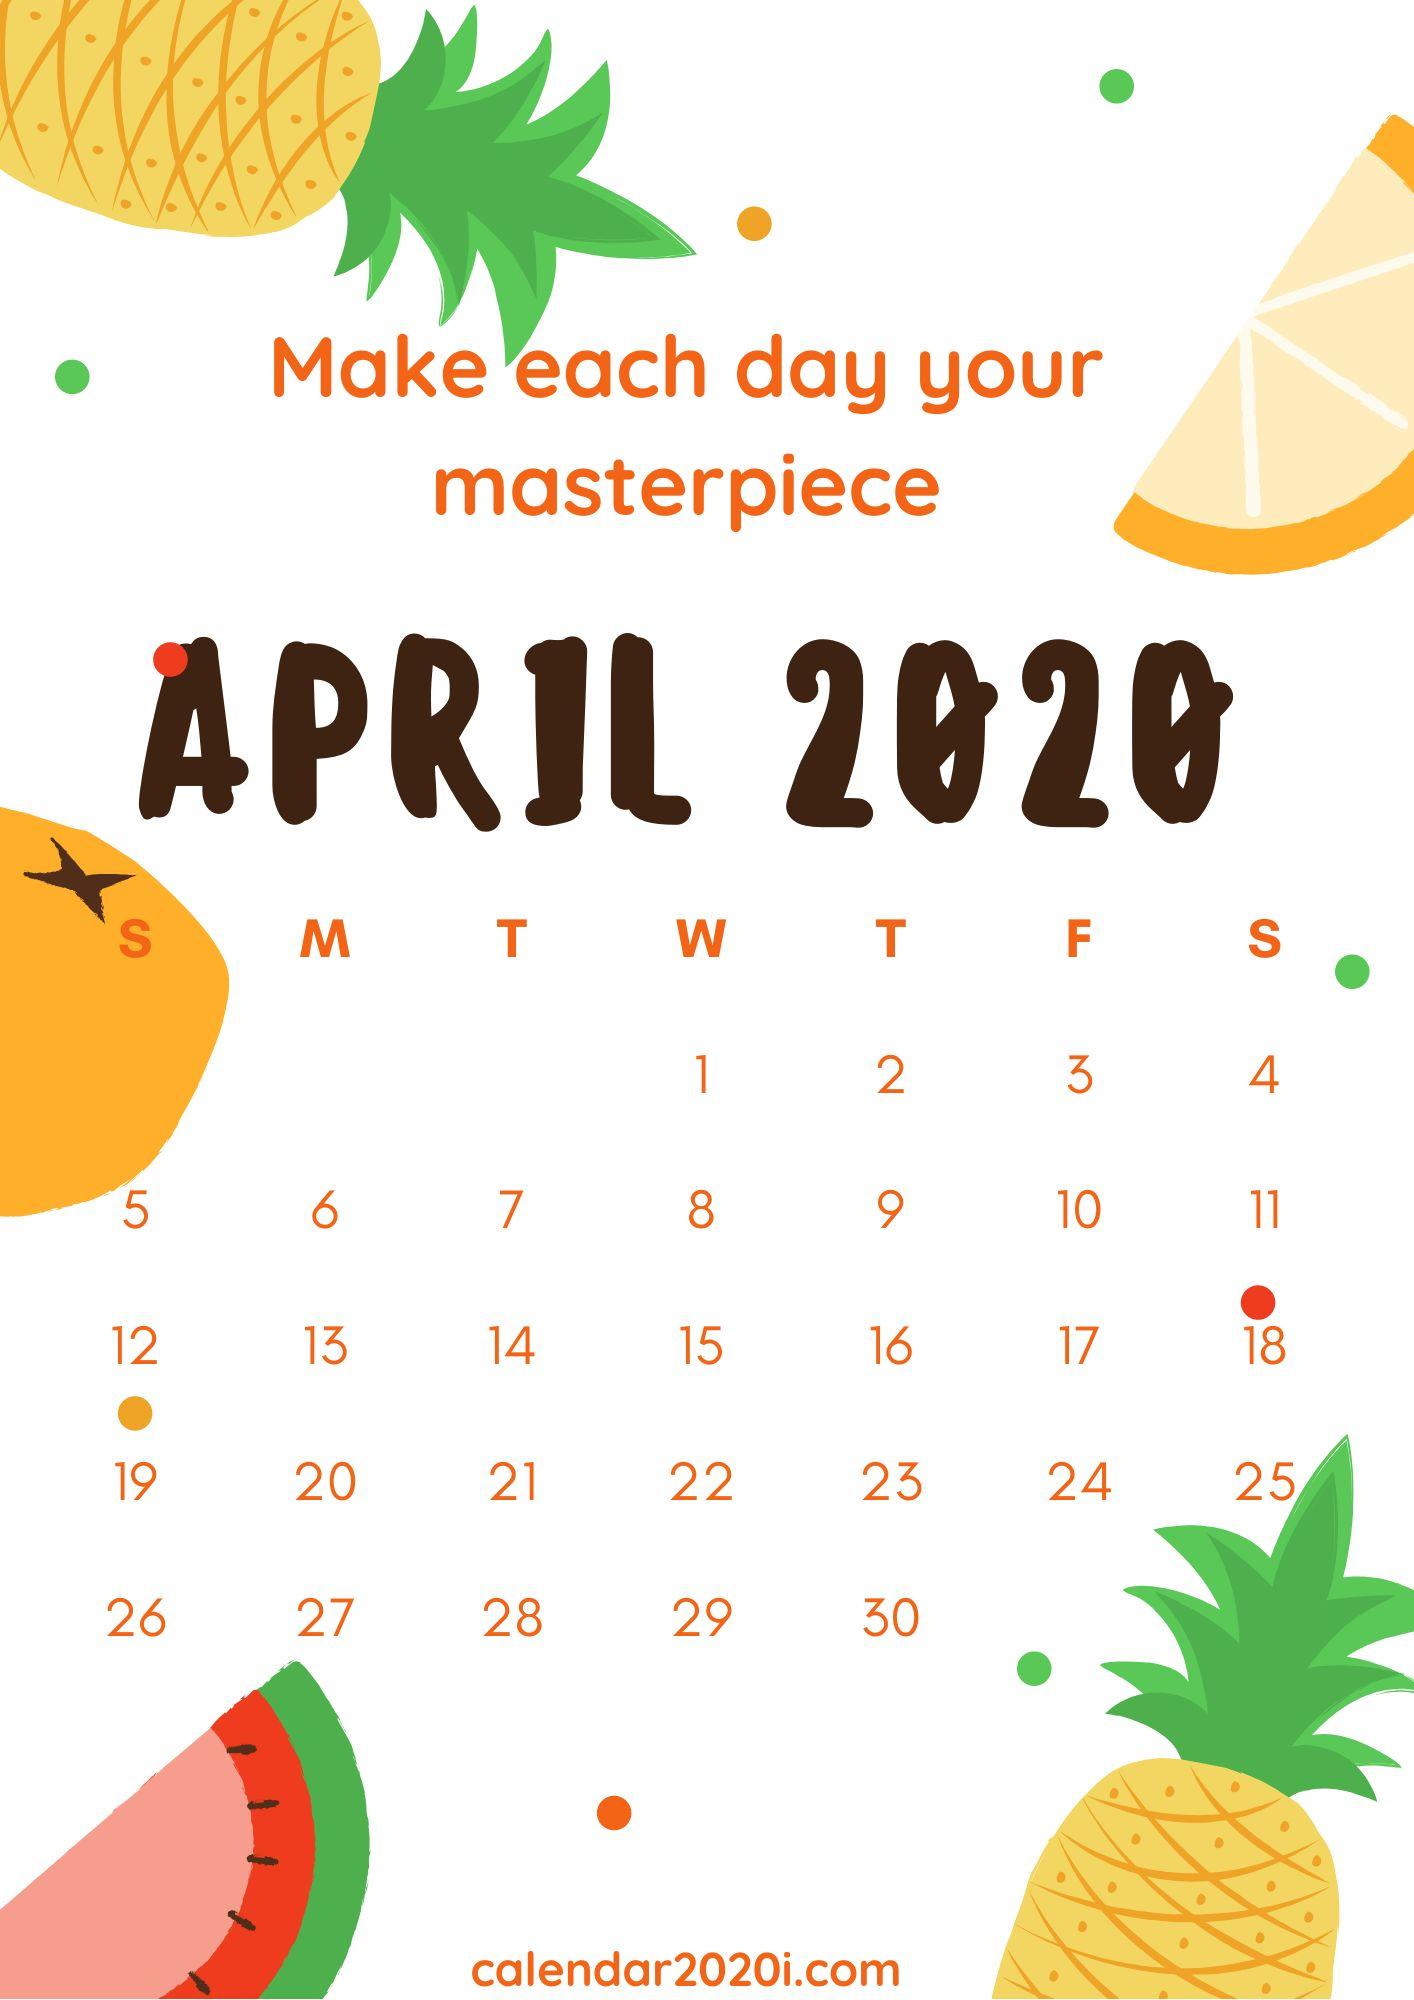 Inspiring April 2020 Calendar With Quotes   Calendar 2020 Inside April Quotes And Sayings For Calendars